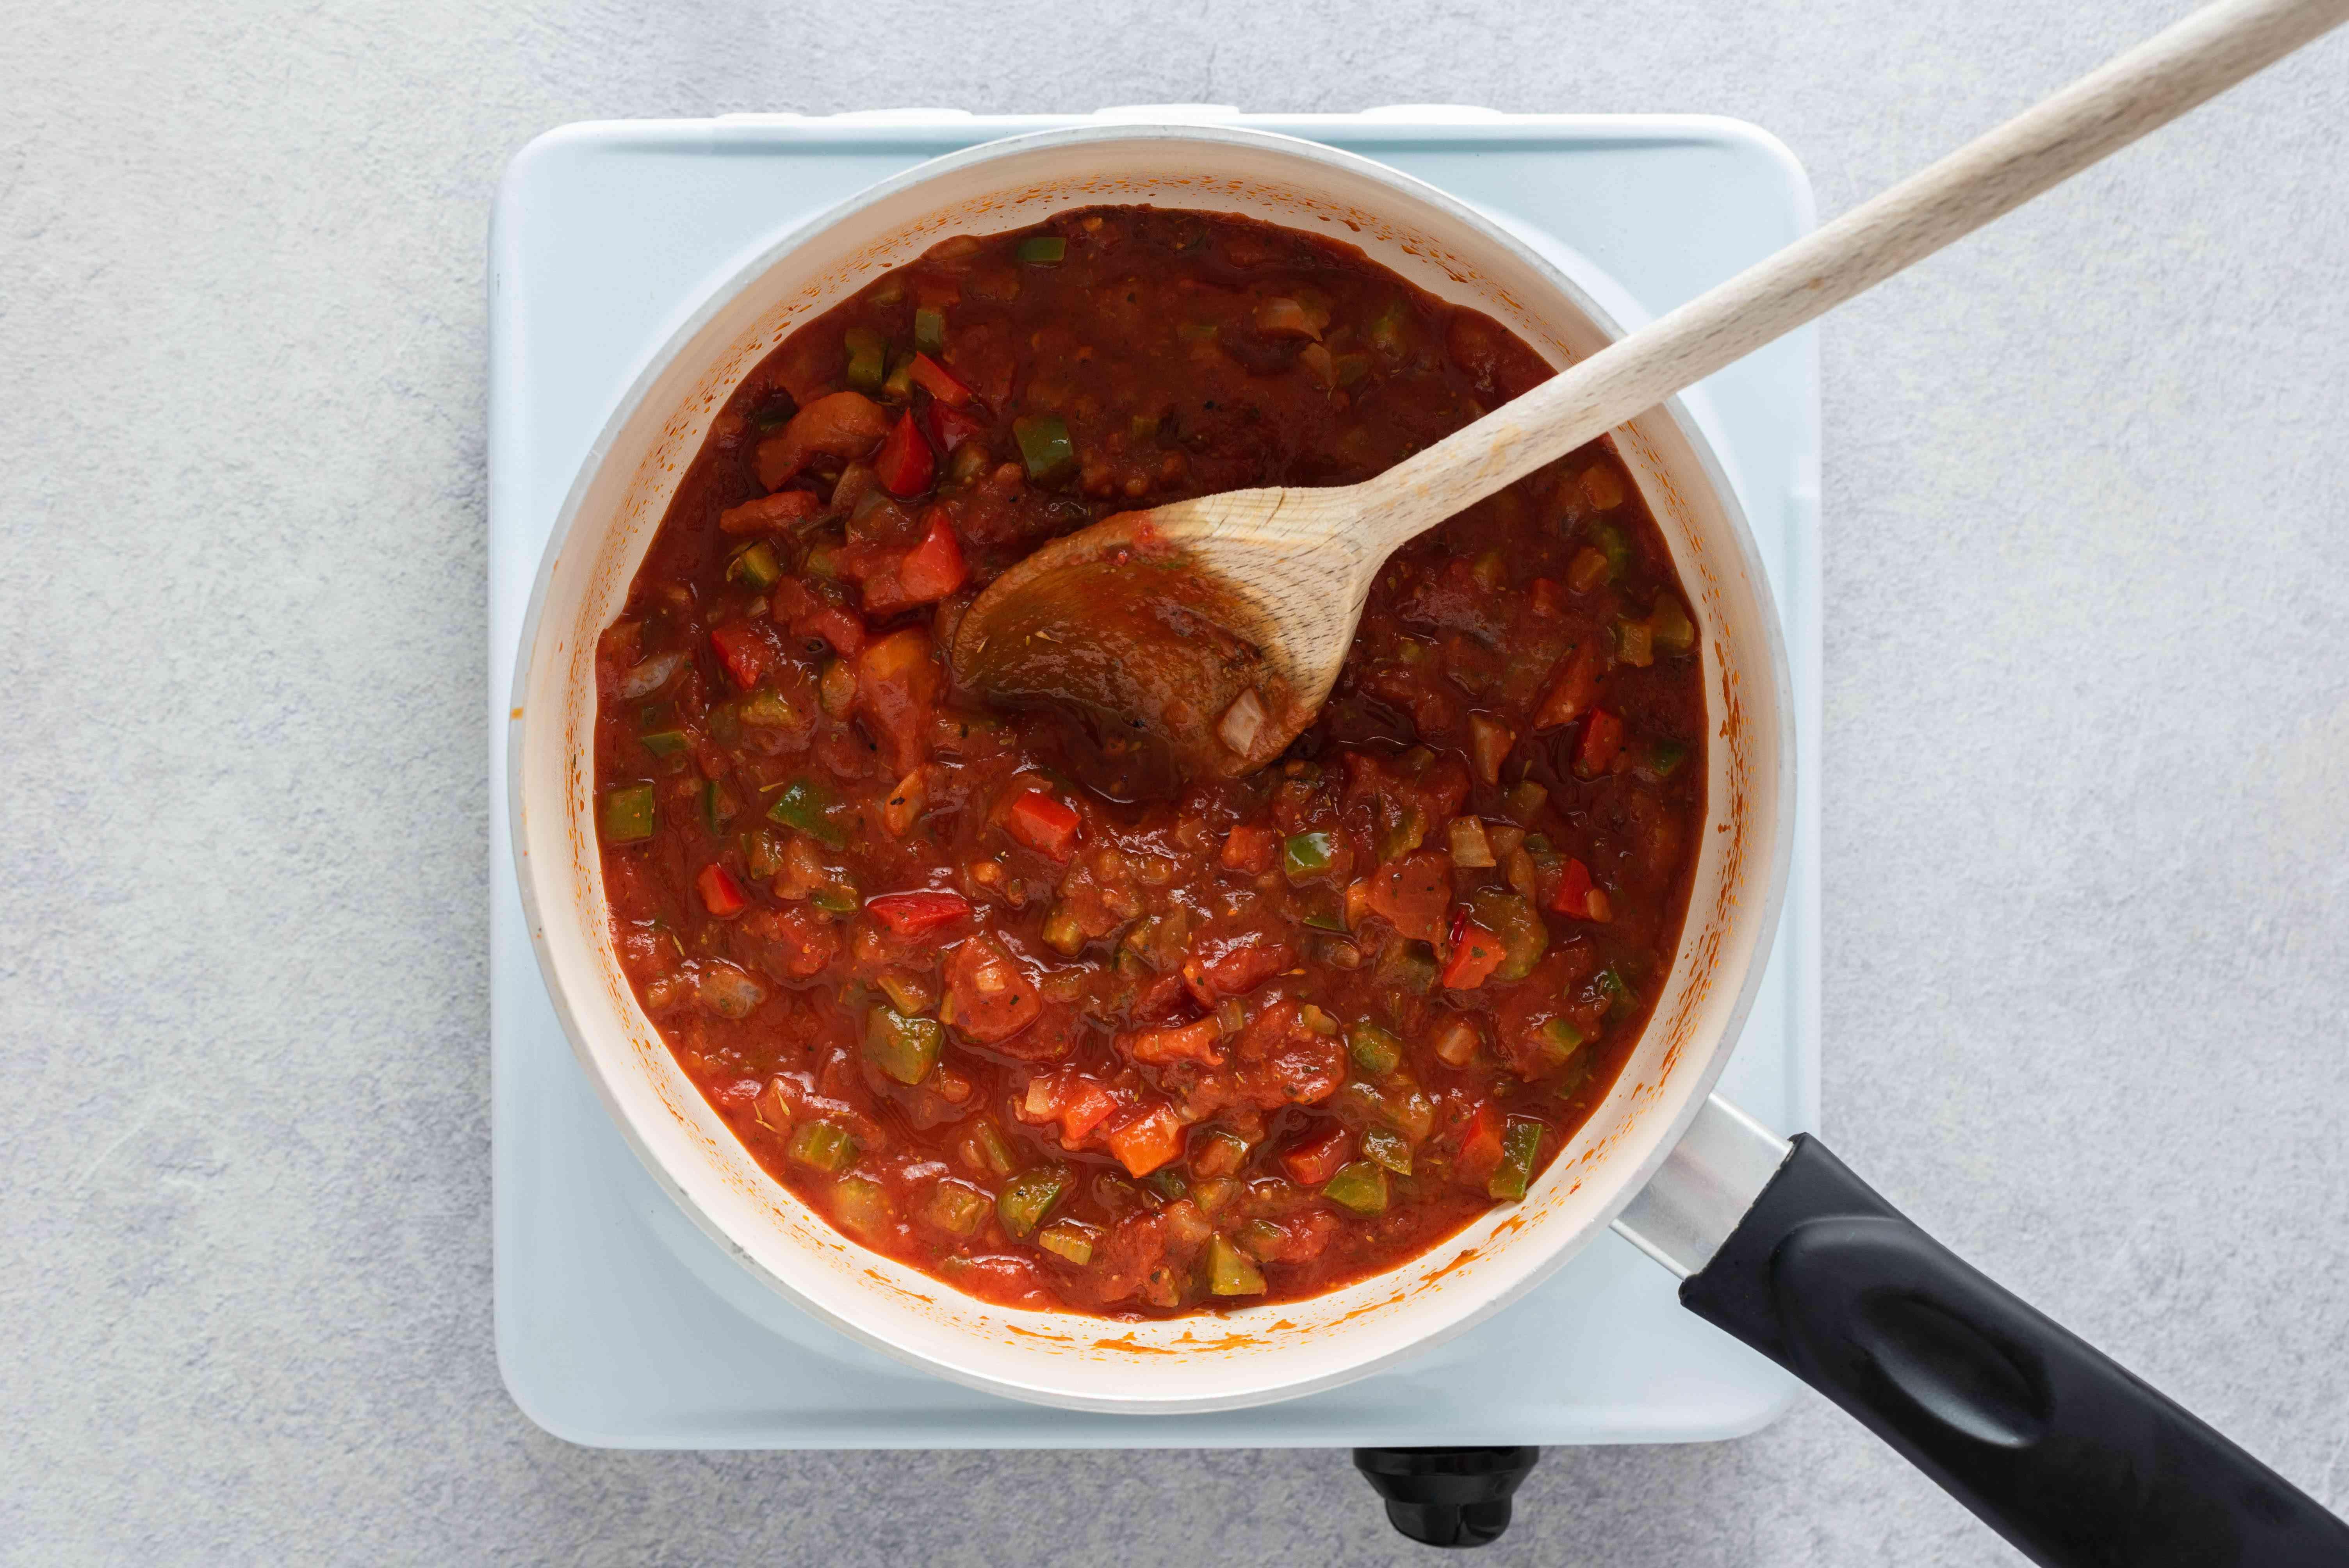 vegetables and seasoning mixture in a pan